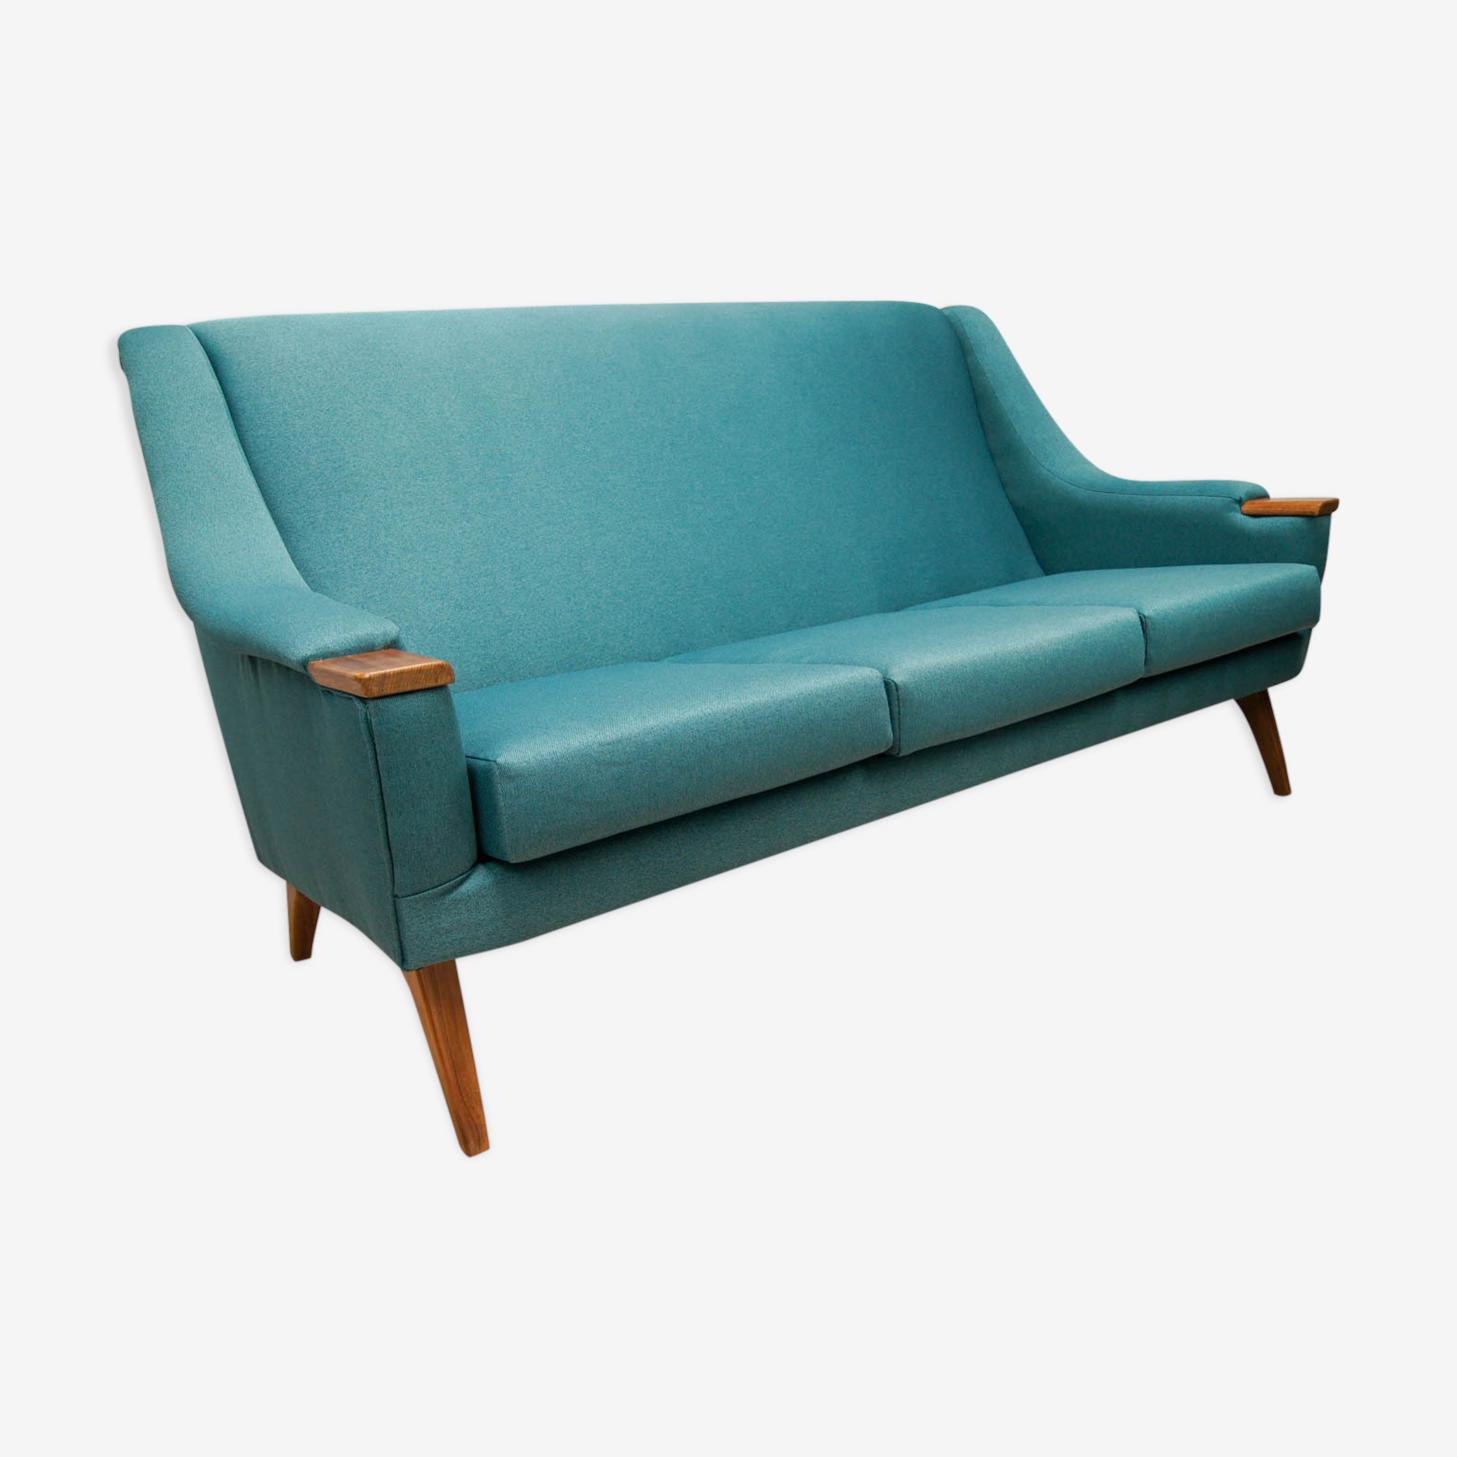 Canapé années 1960